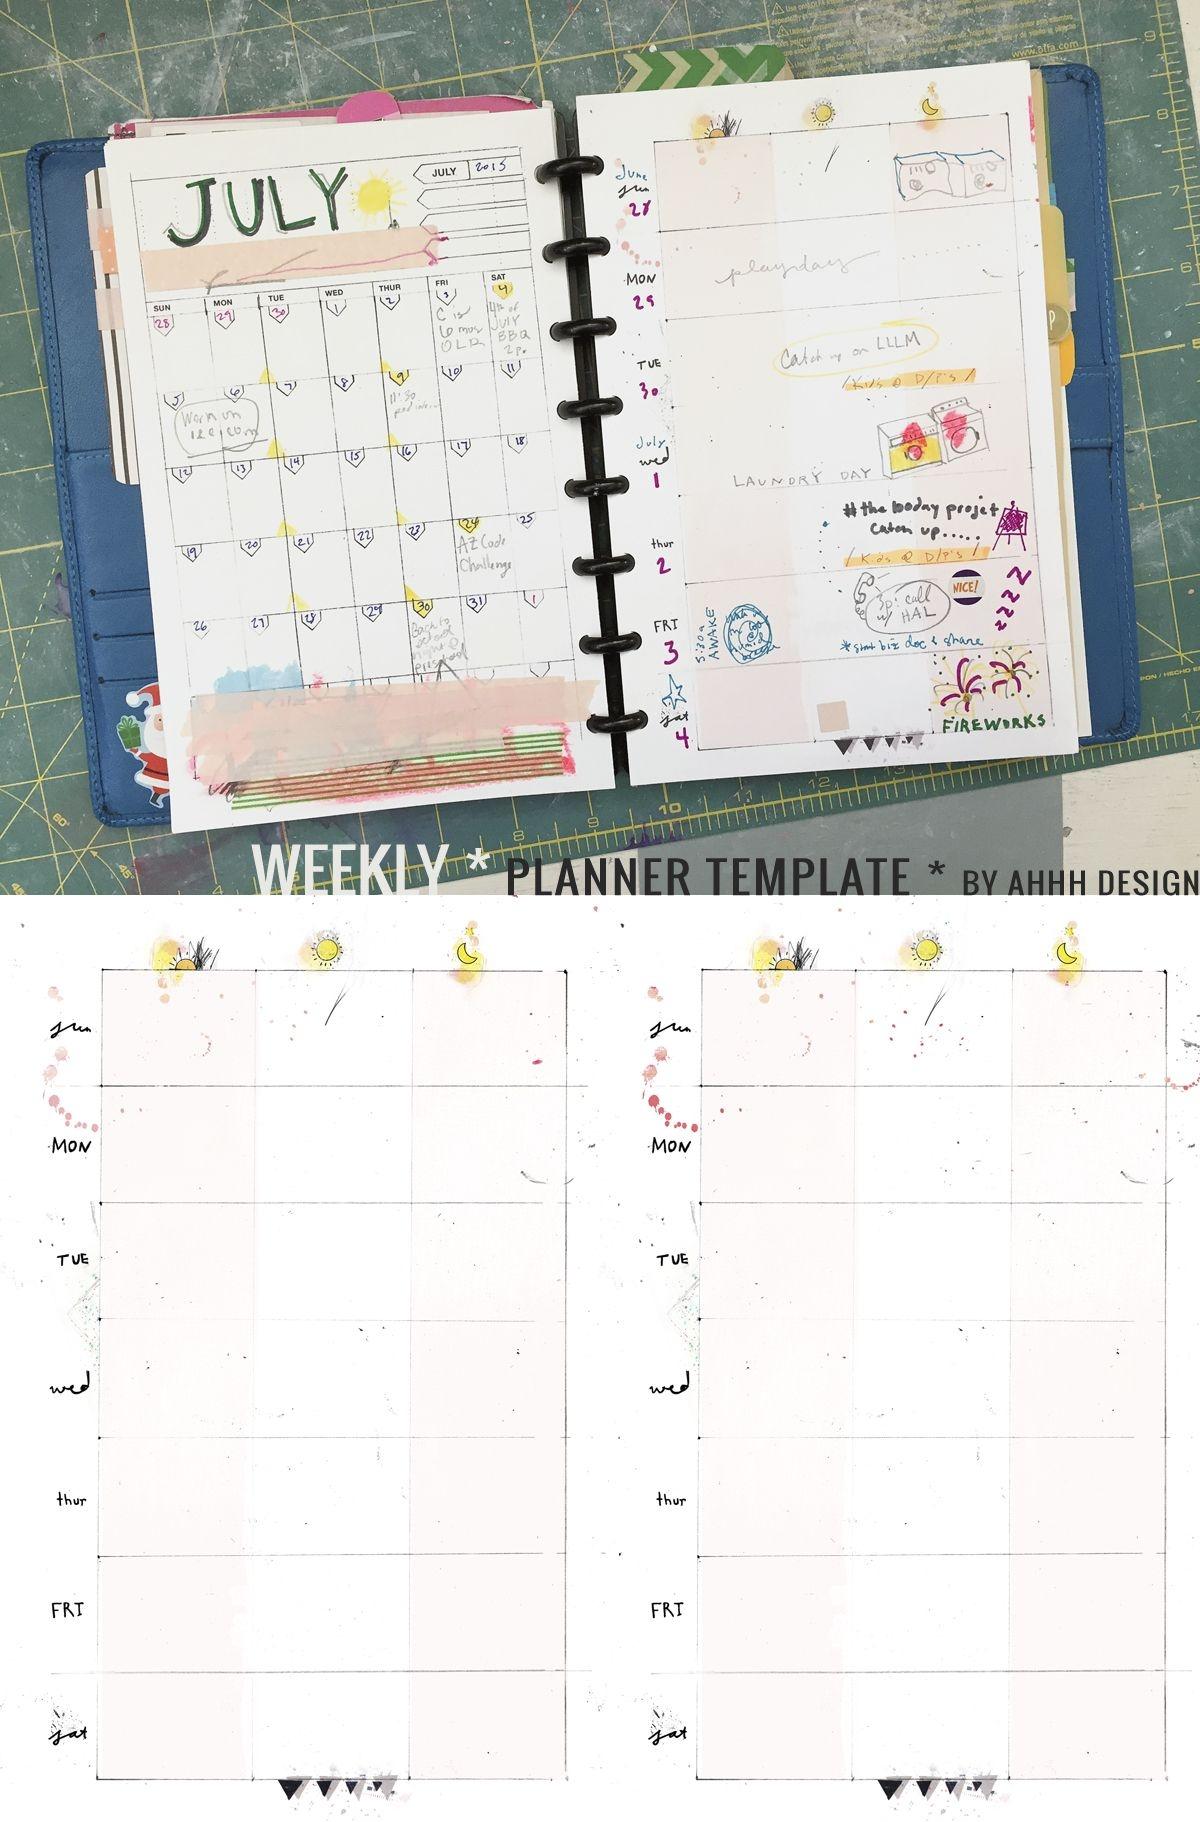 Diy Planner Archives ⋆ Amanda Hawkins | Ahhh Designamanda